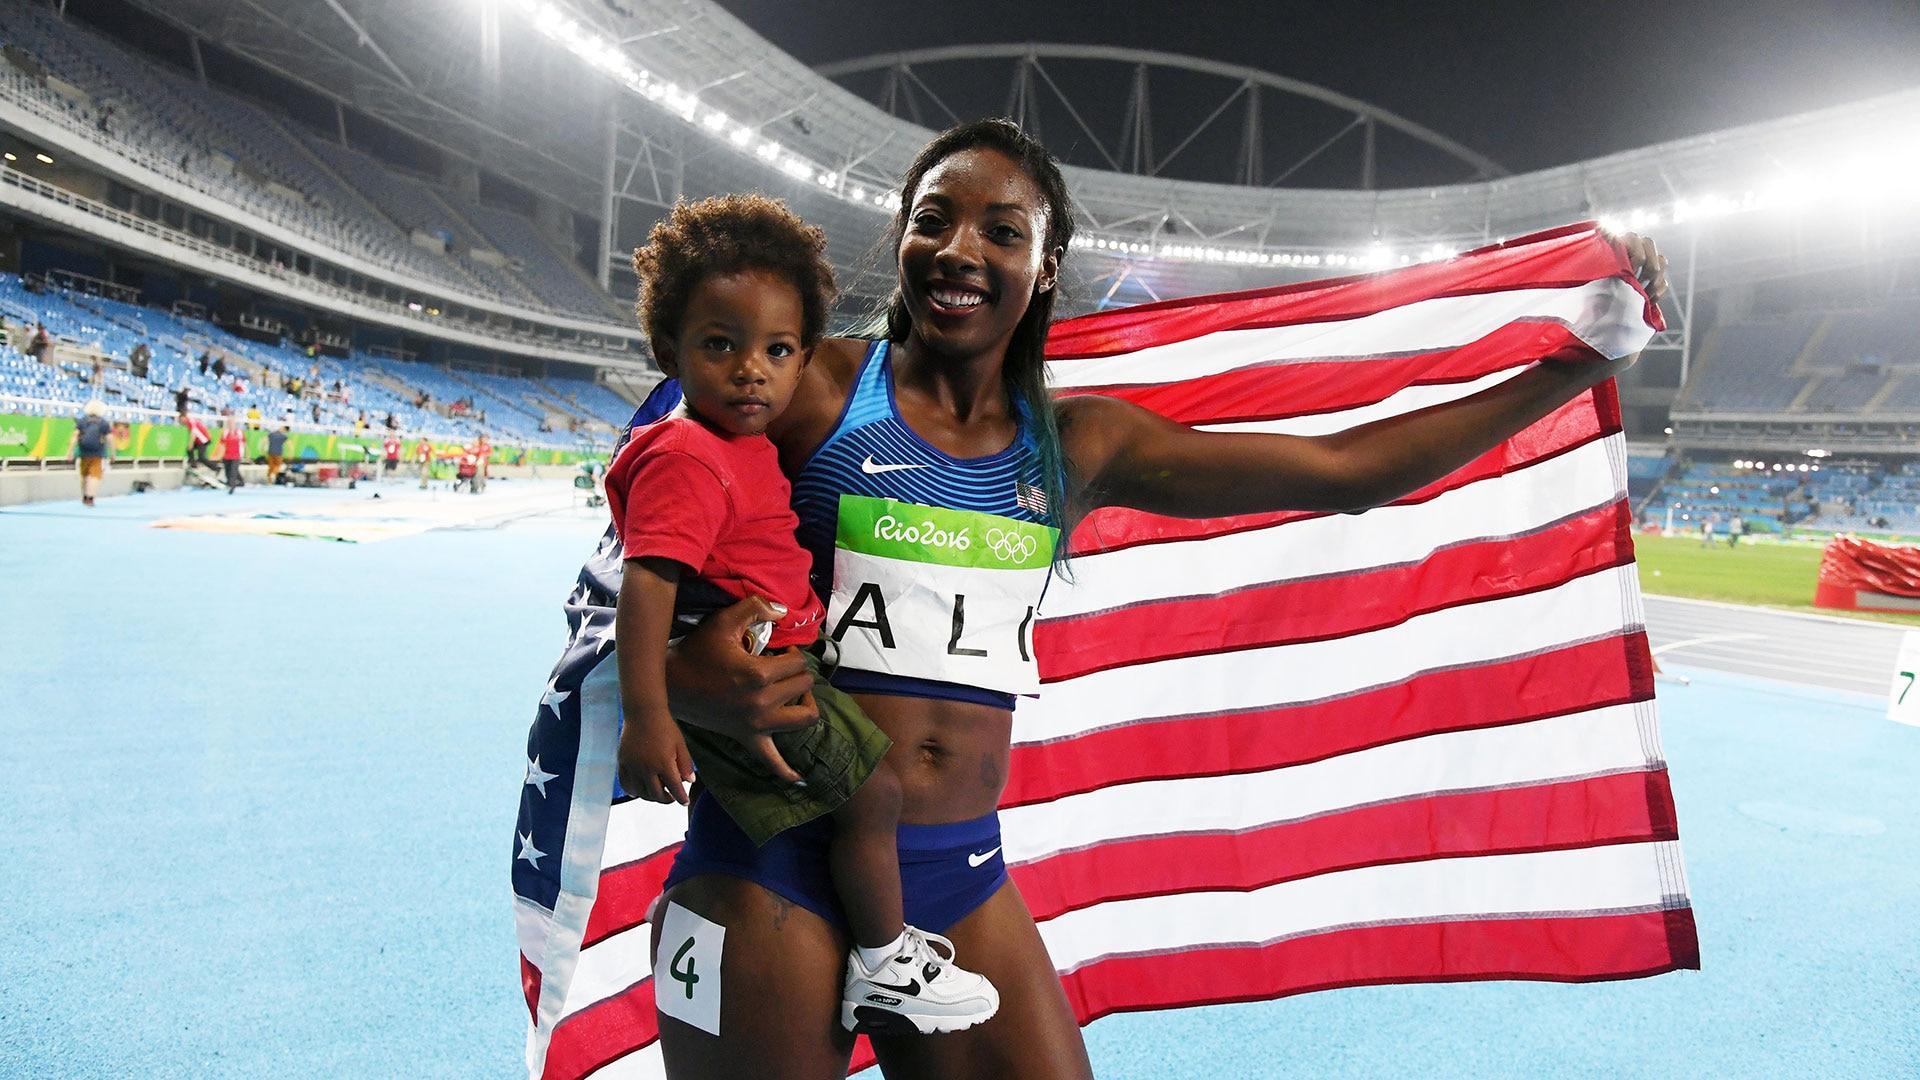 Nia Ali celebrates with her son, Titus, at the 2016 Rio Games